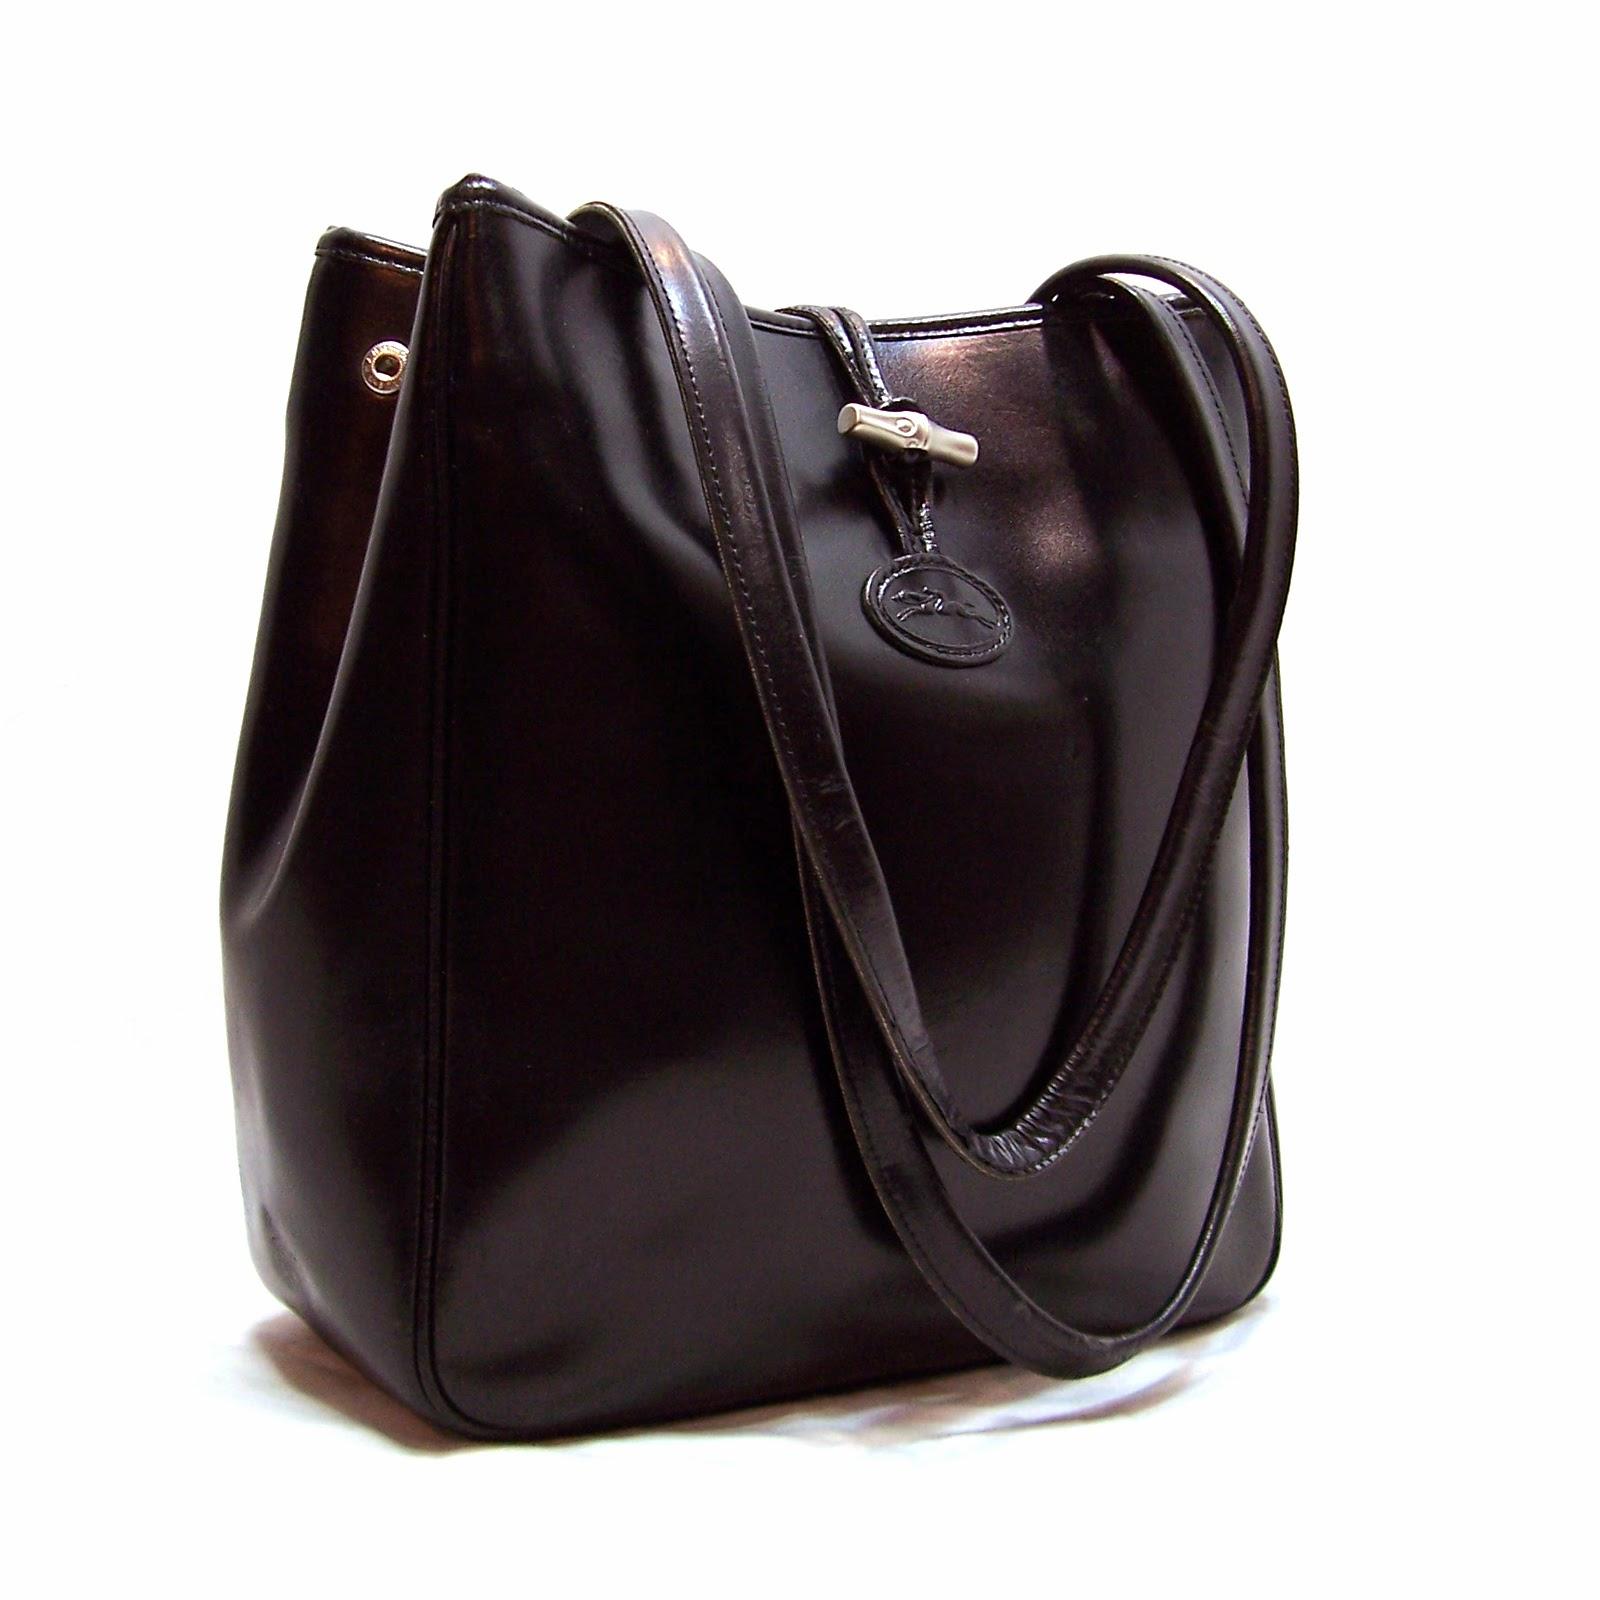 Longchamp Roseau Large Tote Black Leather Shoulder Bag ... c0cffa2e98e41